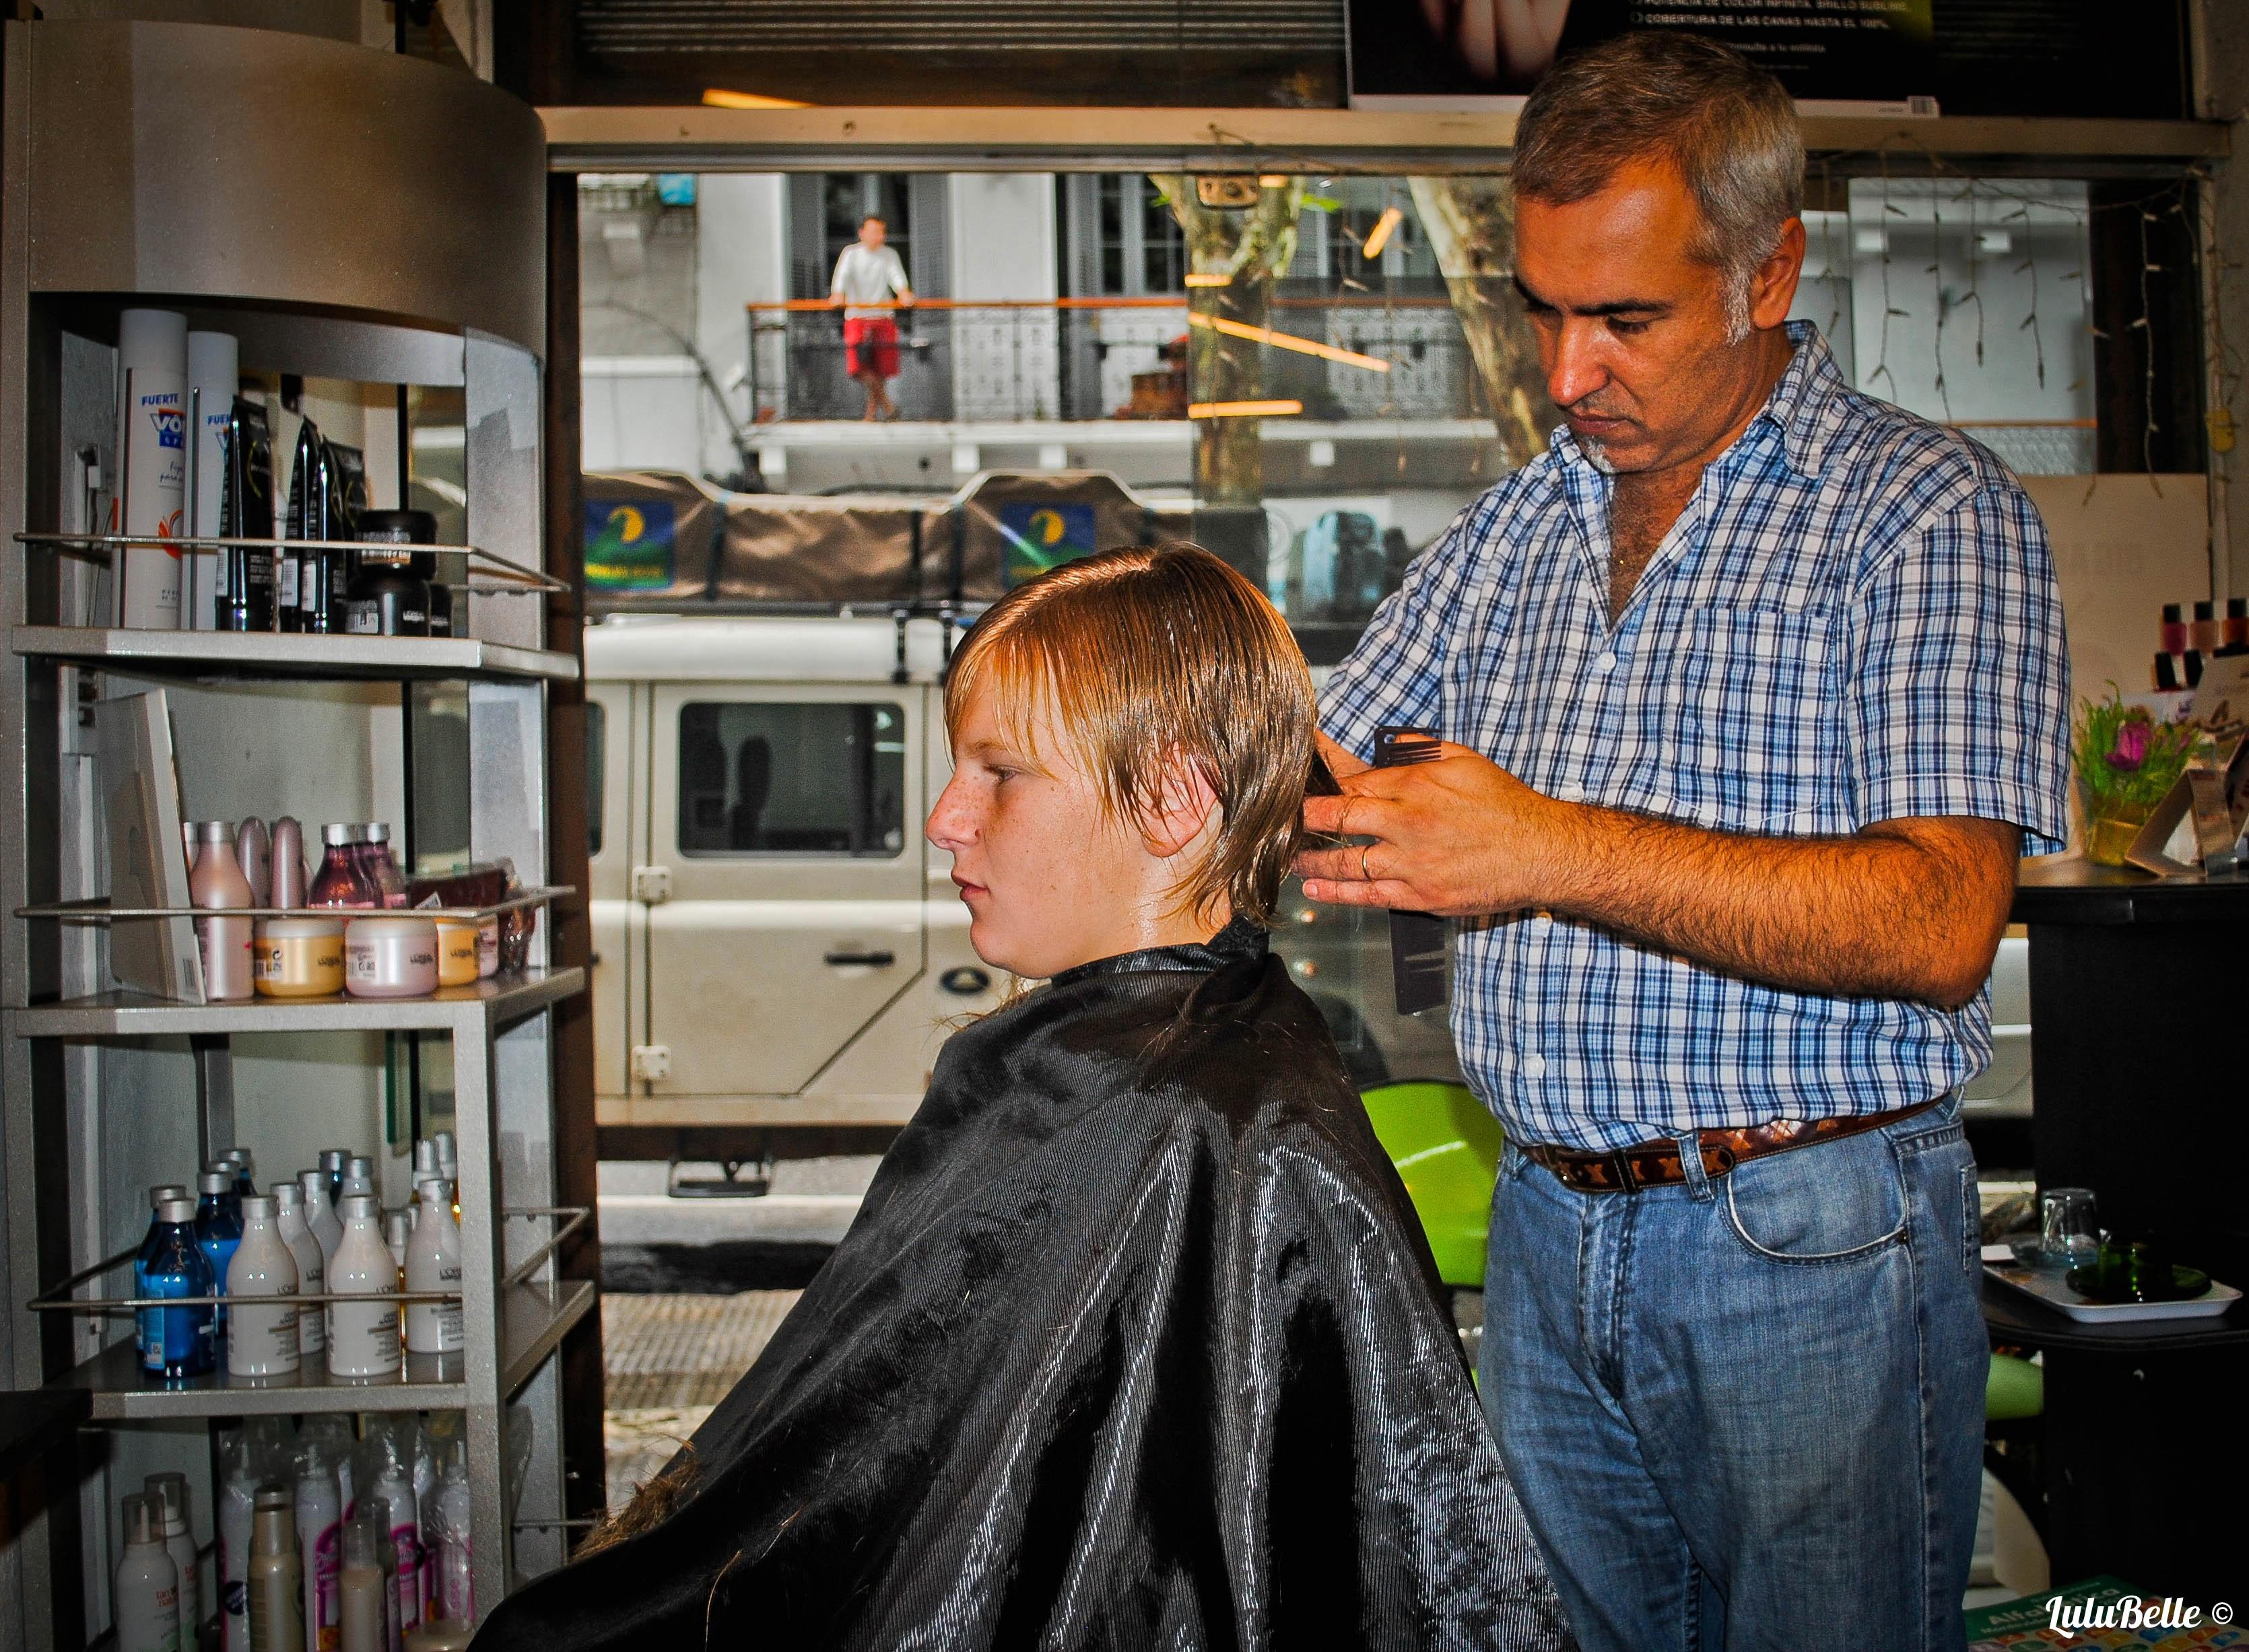 Keelan gets the Bieber cut, A2A